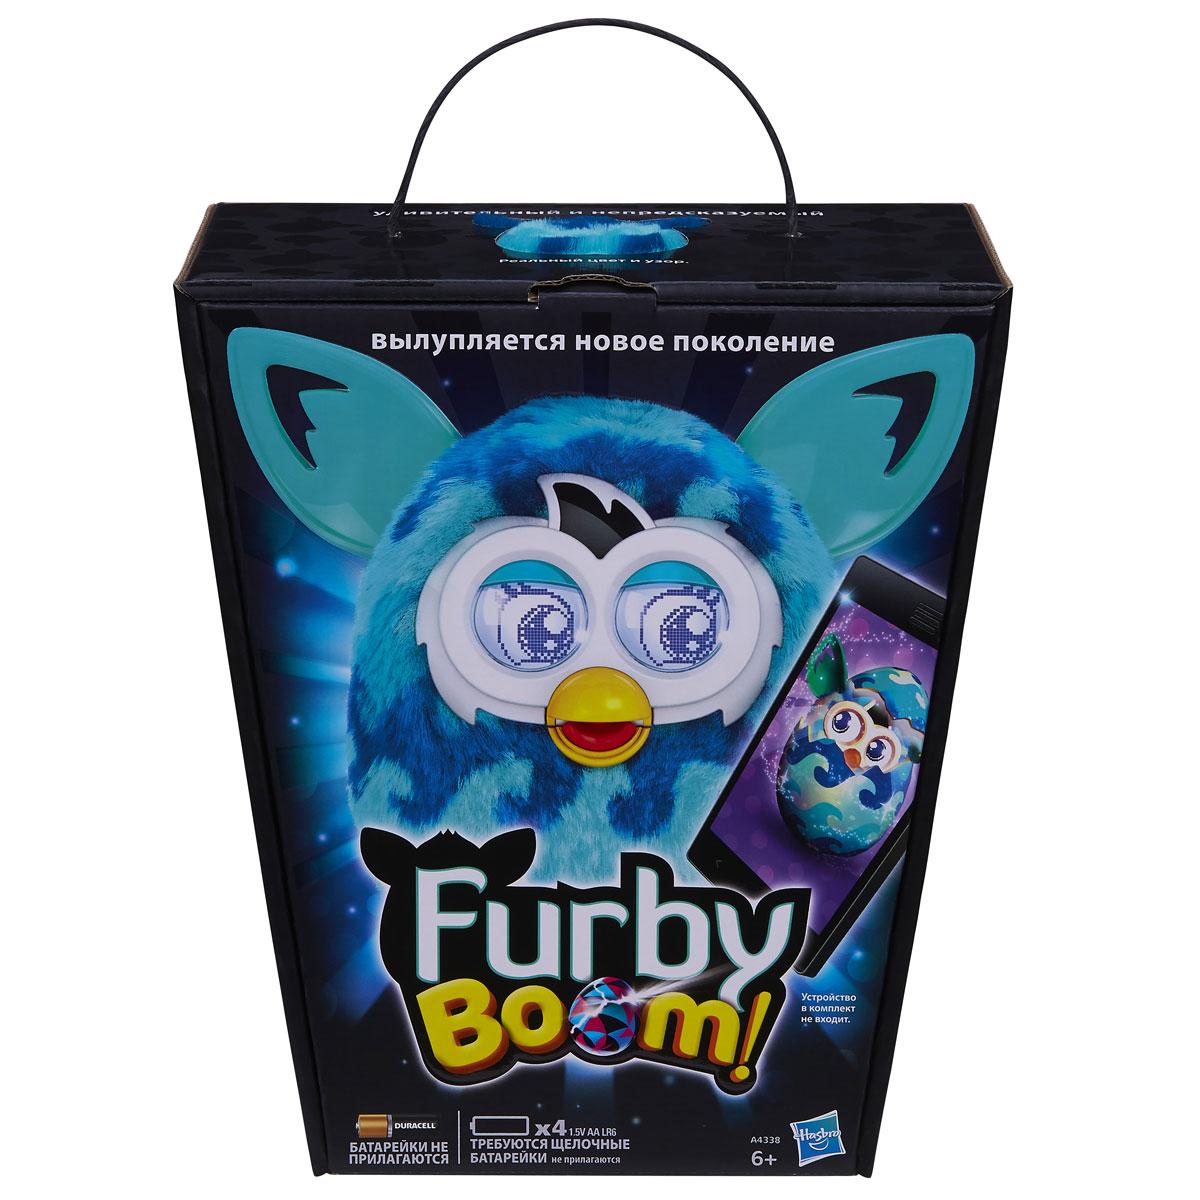 Furby (Ը���) Boom ������������� ������� ������ ����� (������� ������� �����)